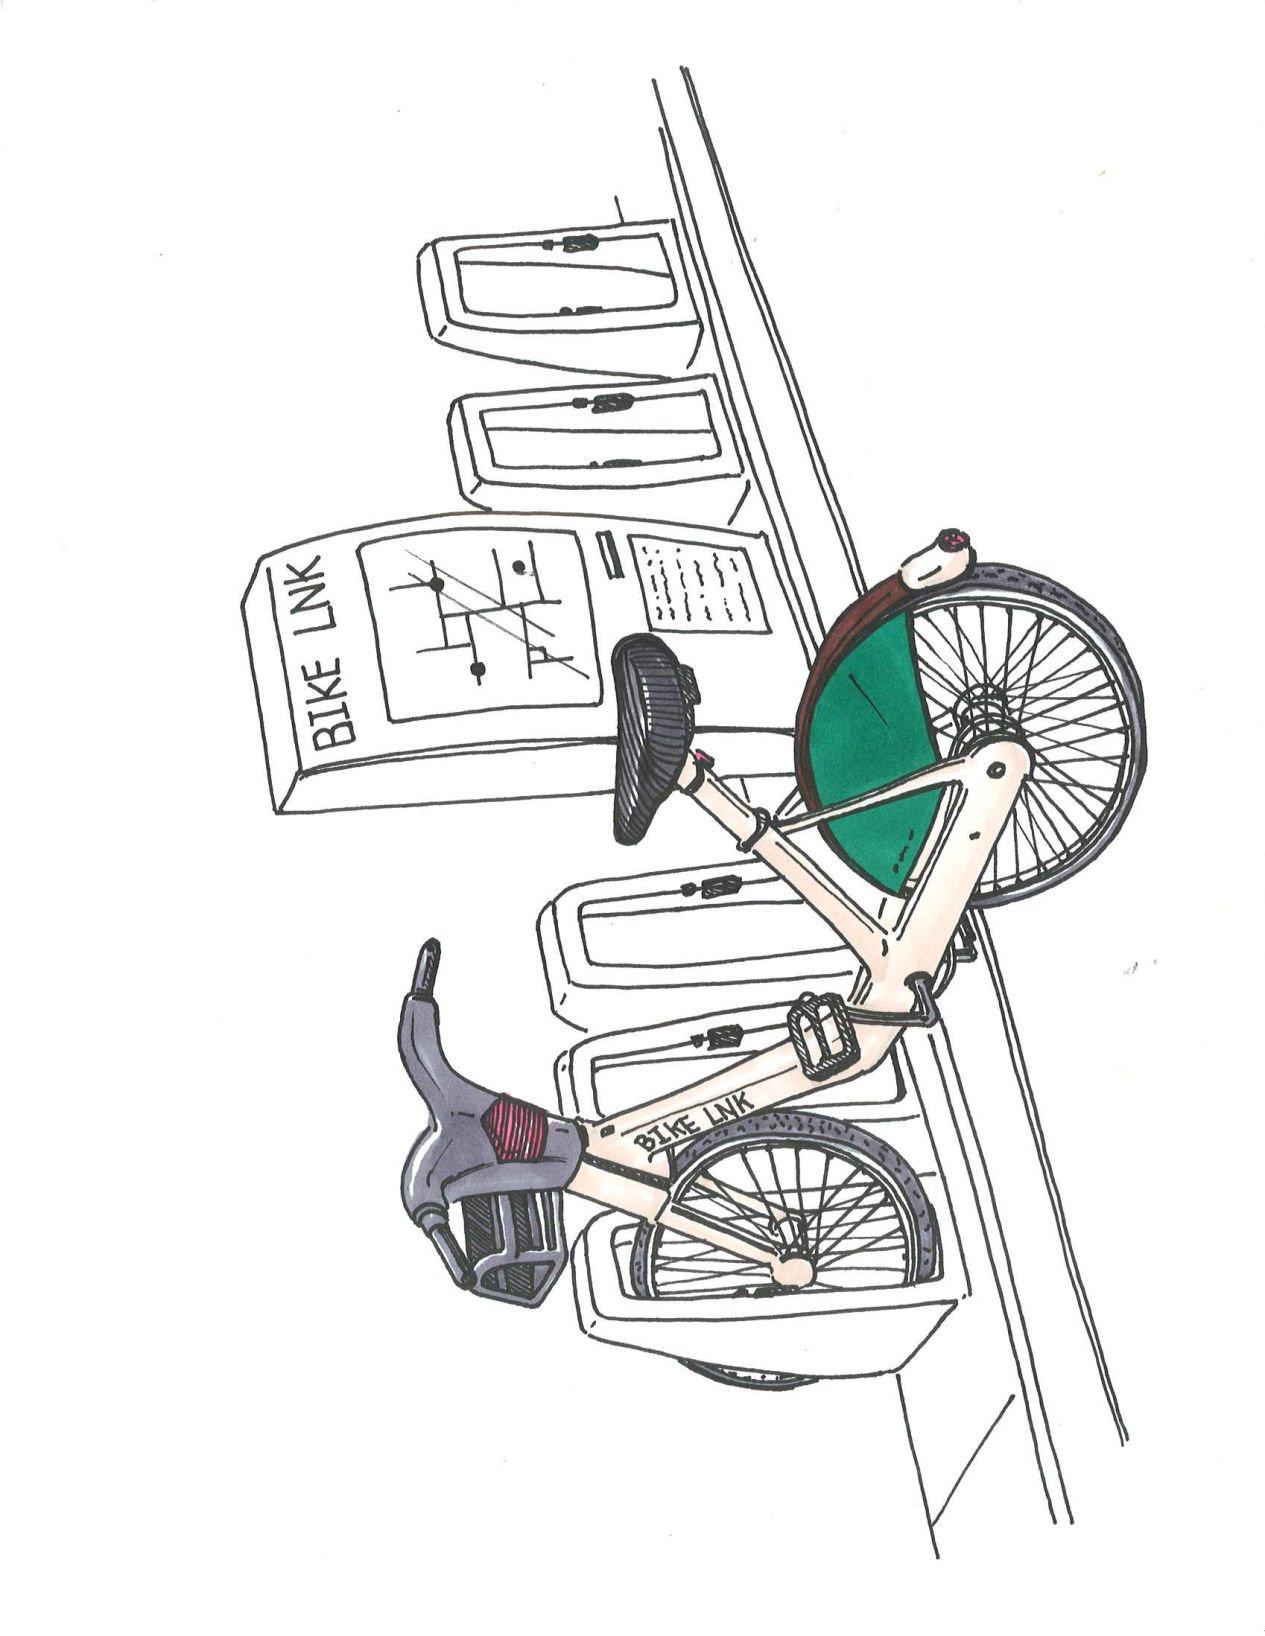 Ellis Bike Lnk Provides Eco Friendly Transportation Option